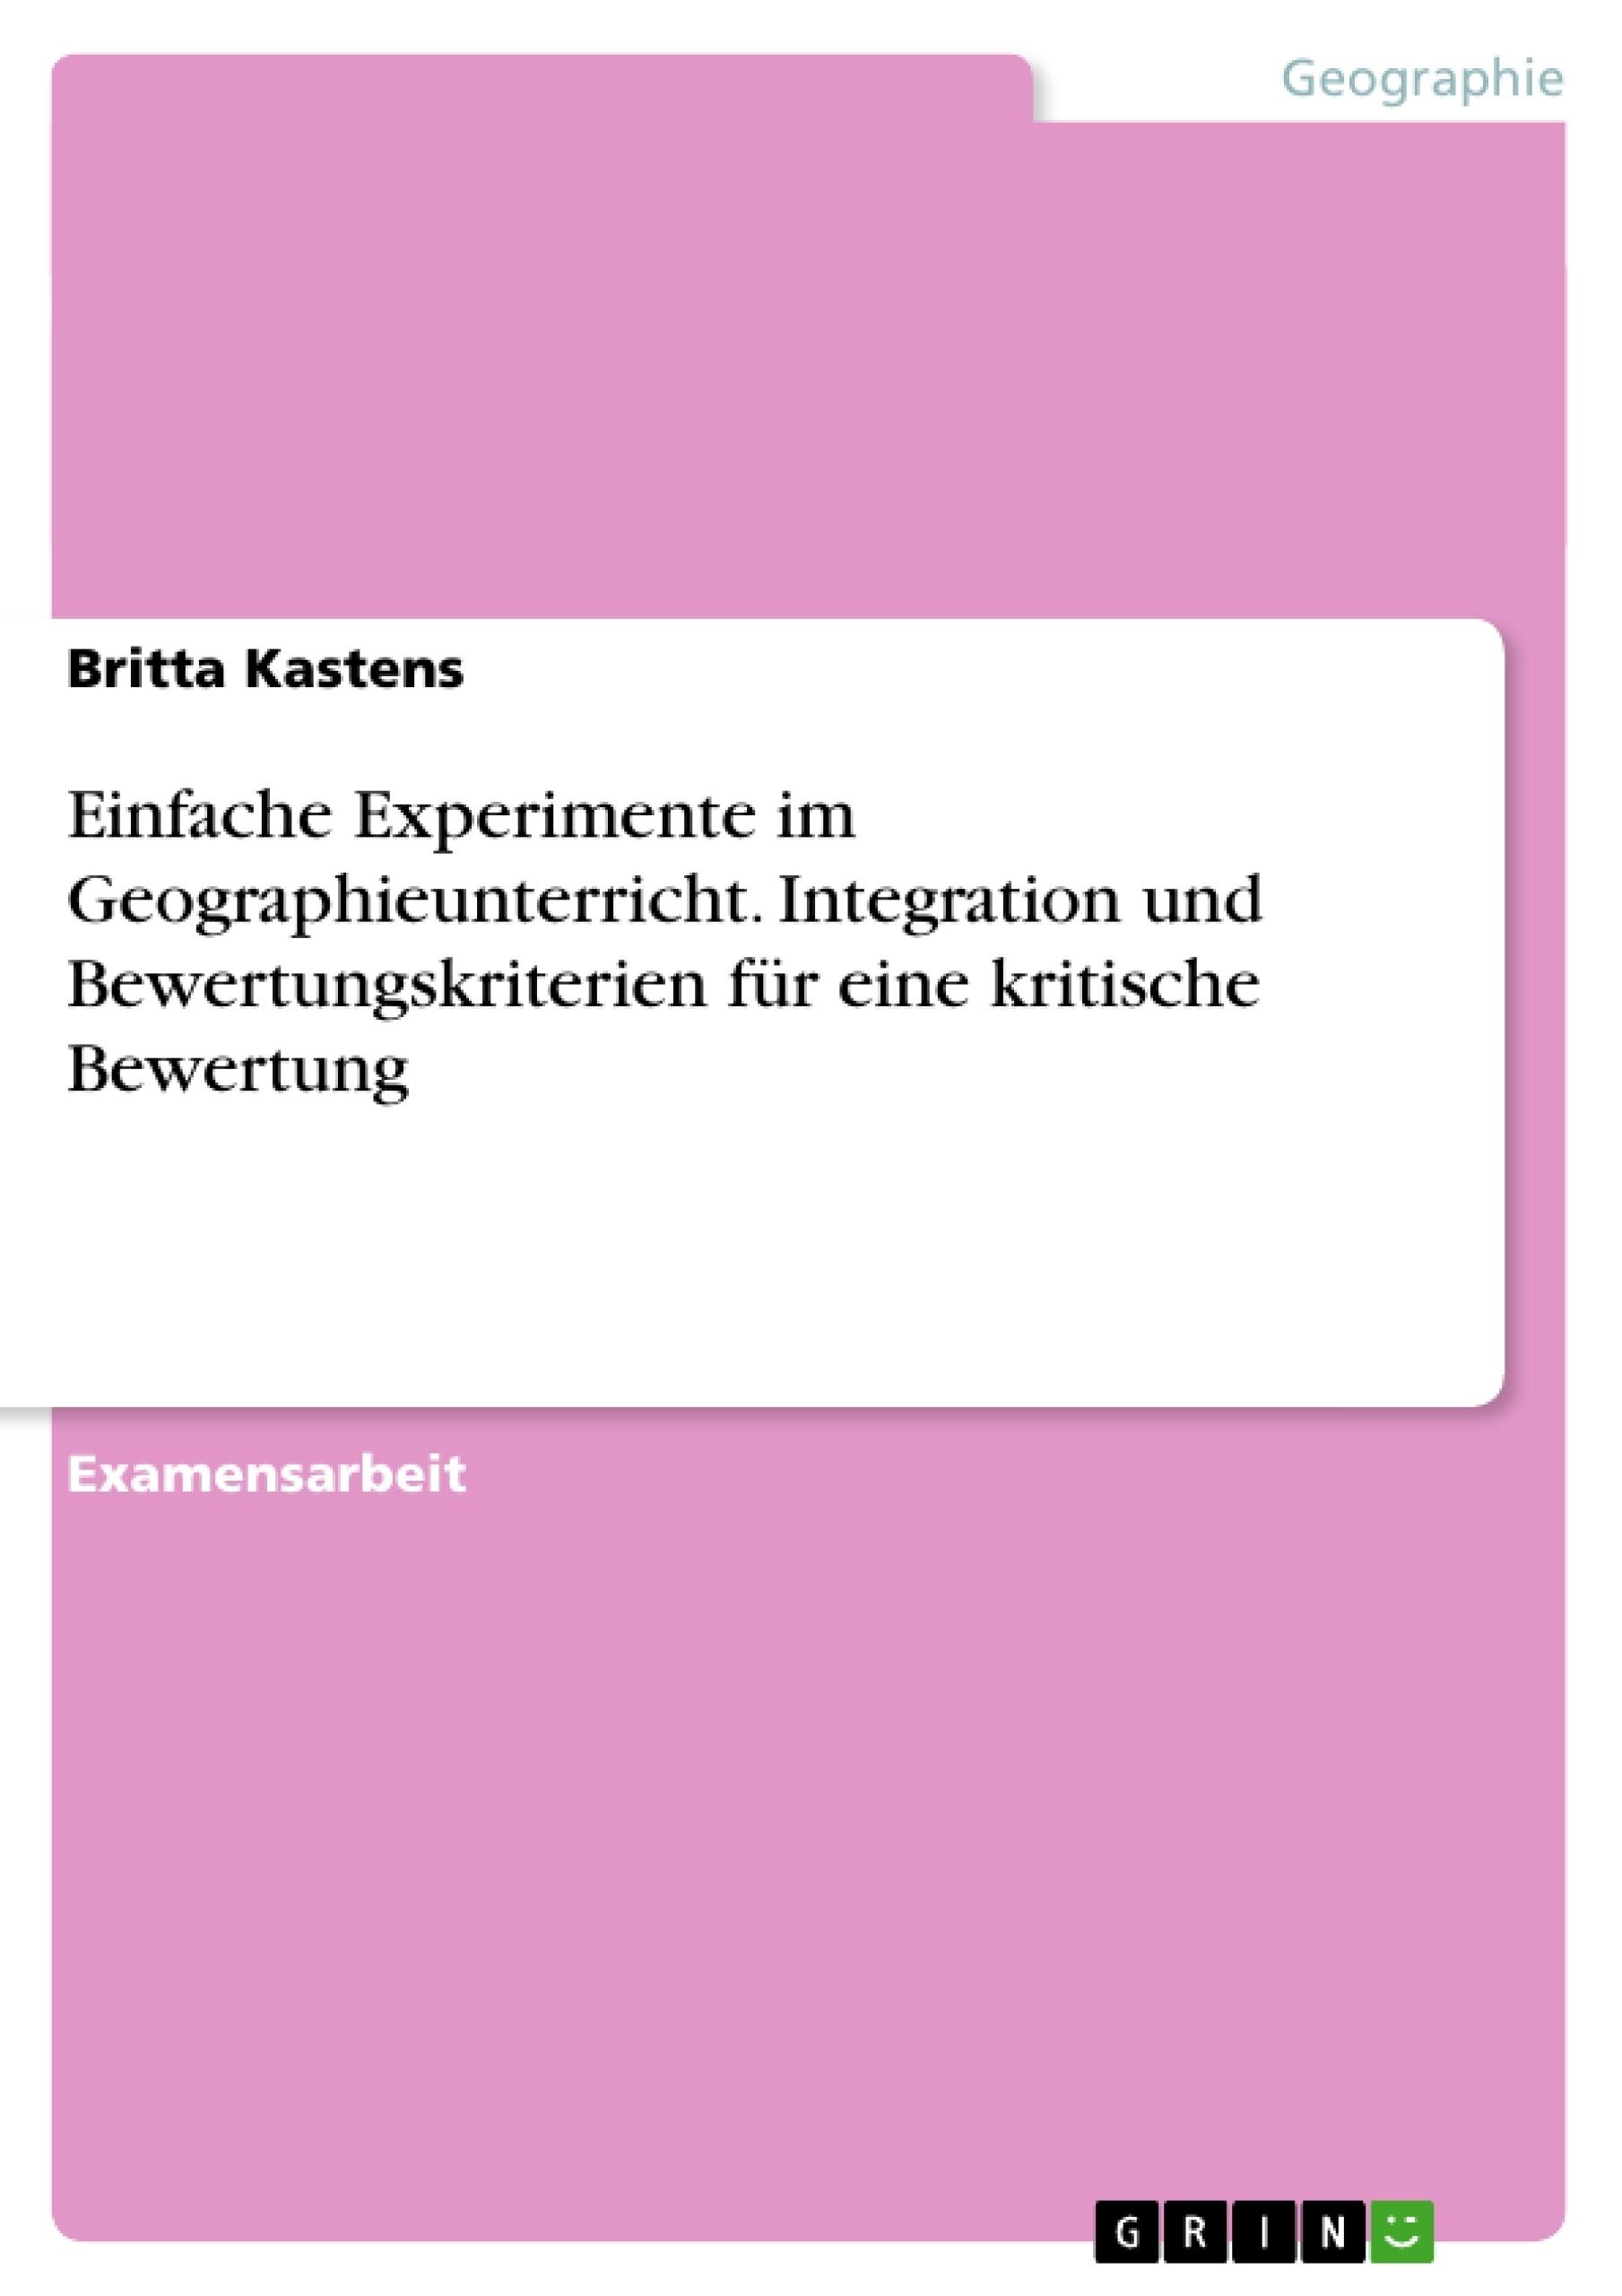 Berühmt Was Arbeitsblatt Kapitel Psychologie Bewertung 1 ...